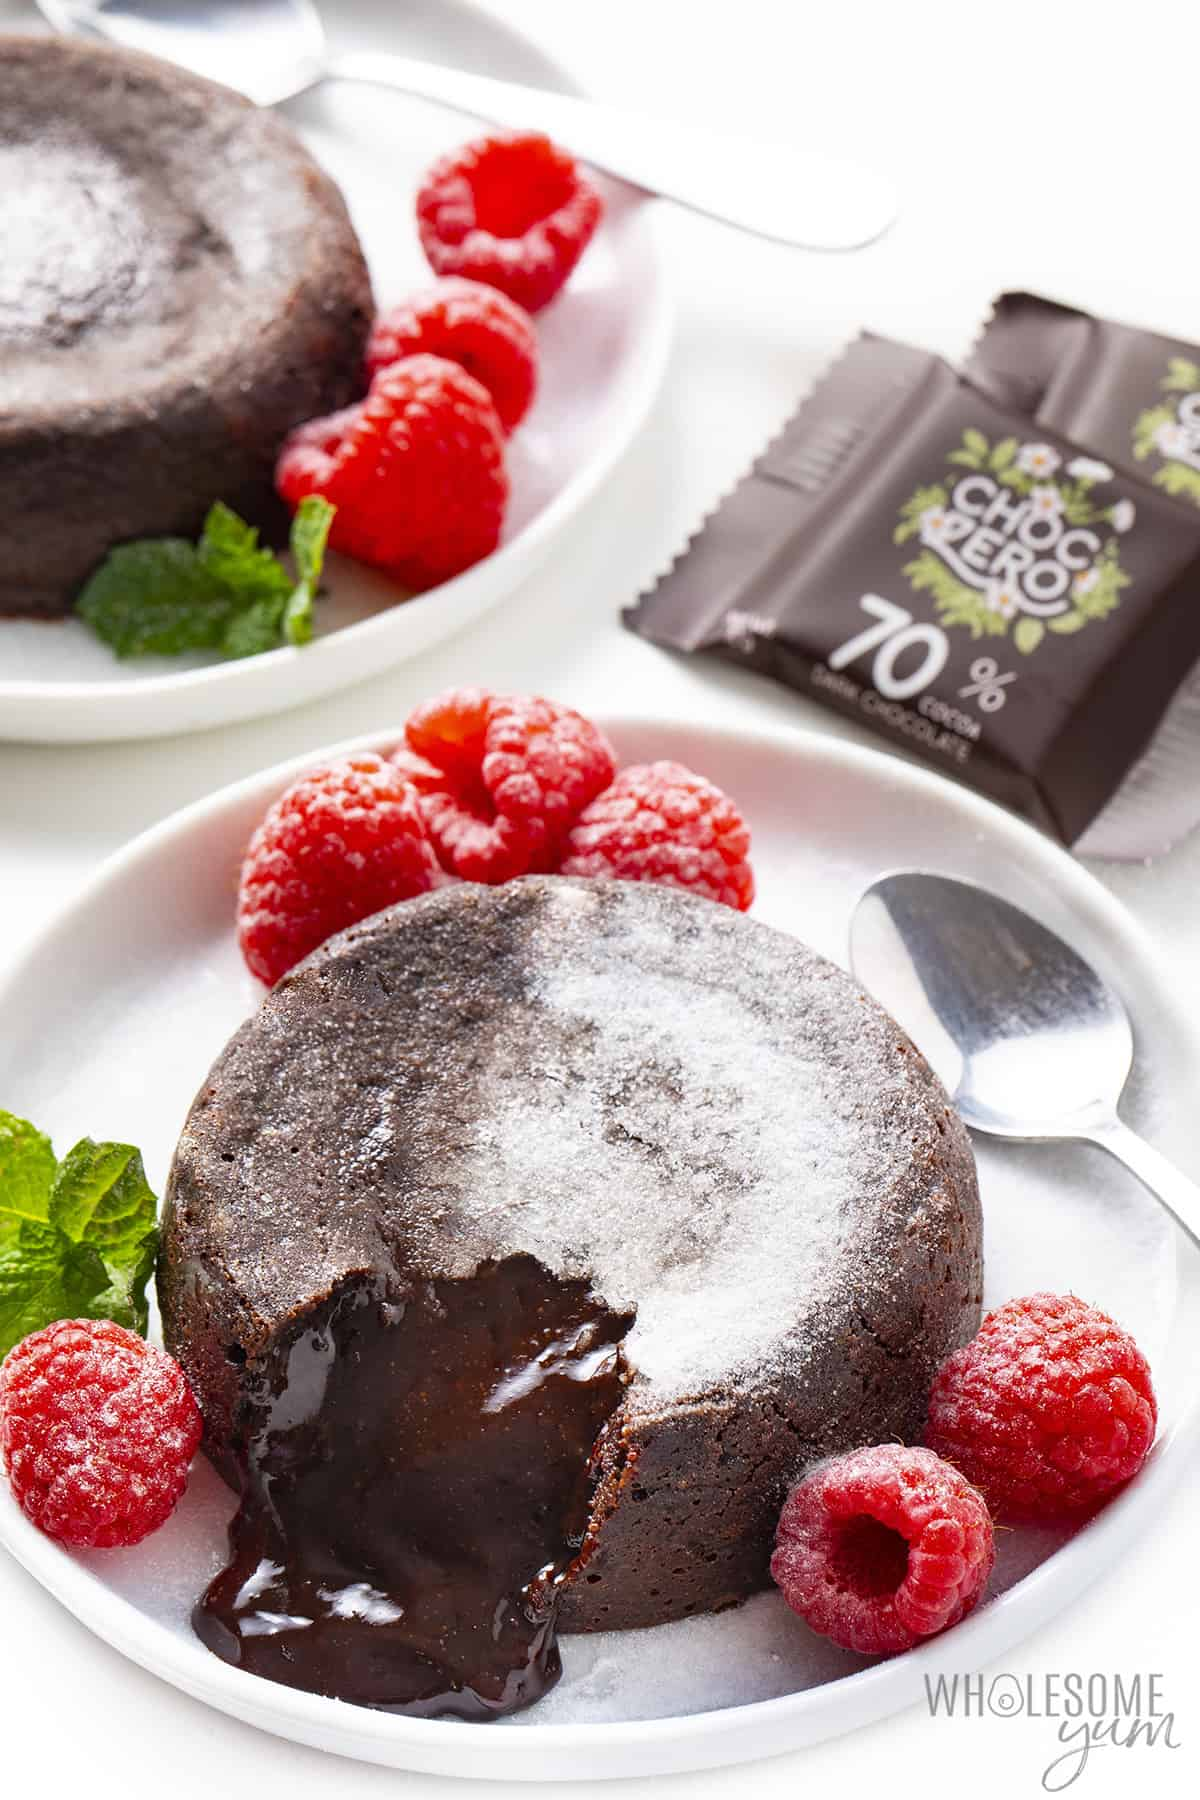 Overflowing keto lava cake on a plate next to ChocZero dark chocolate squares